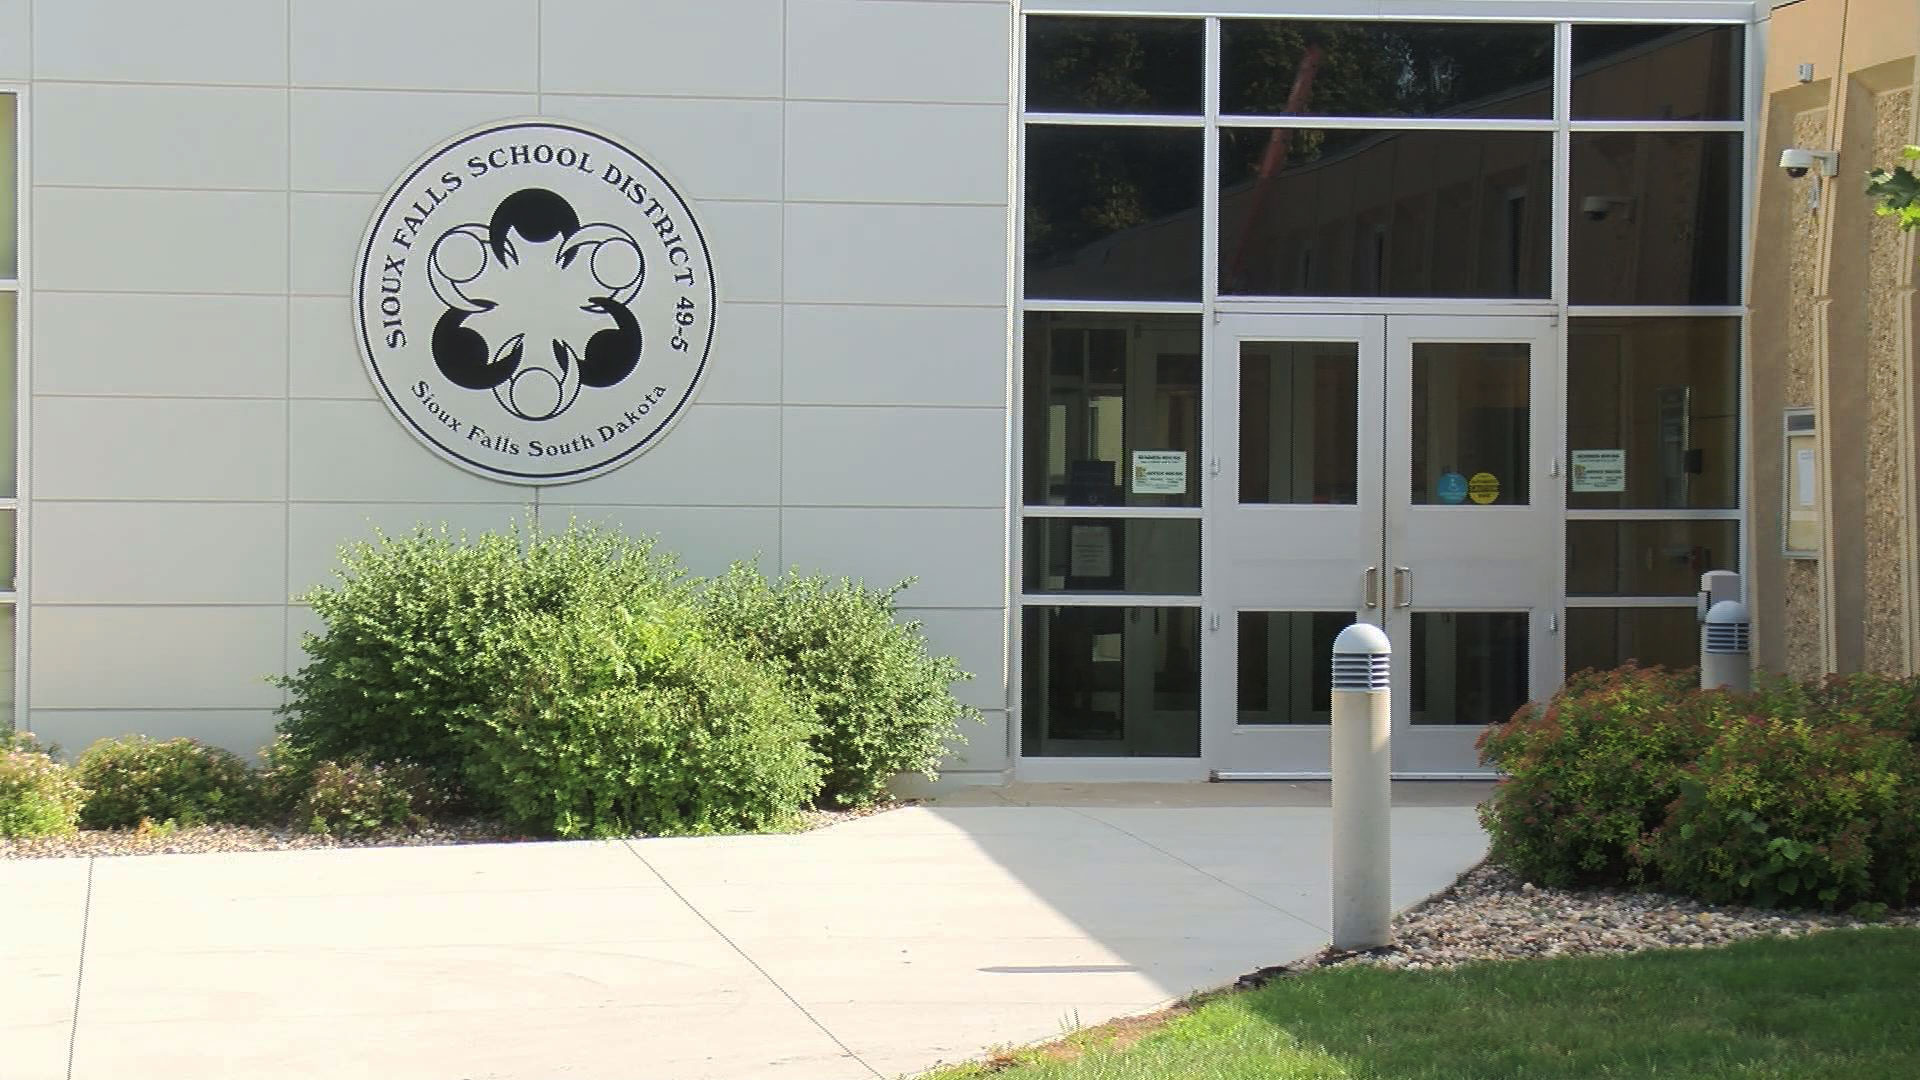 KELO Sioux Falls School District4